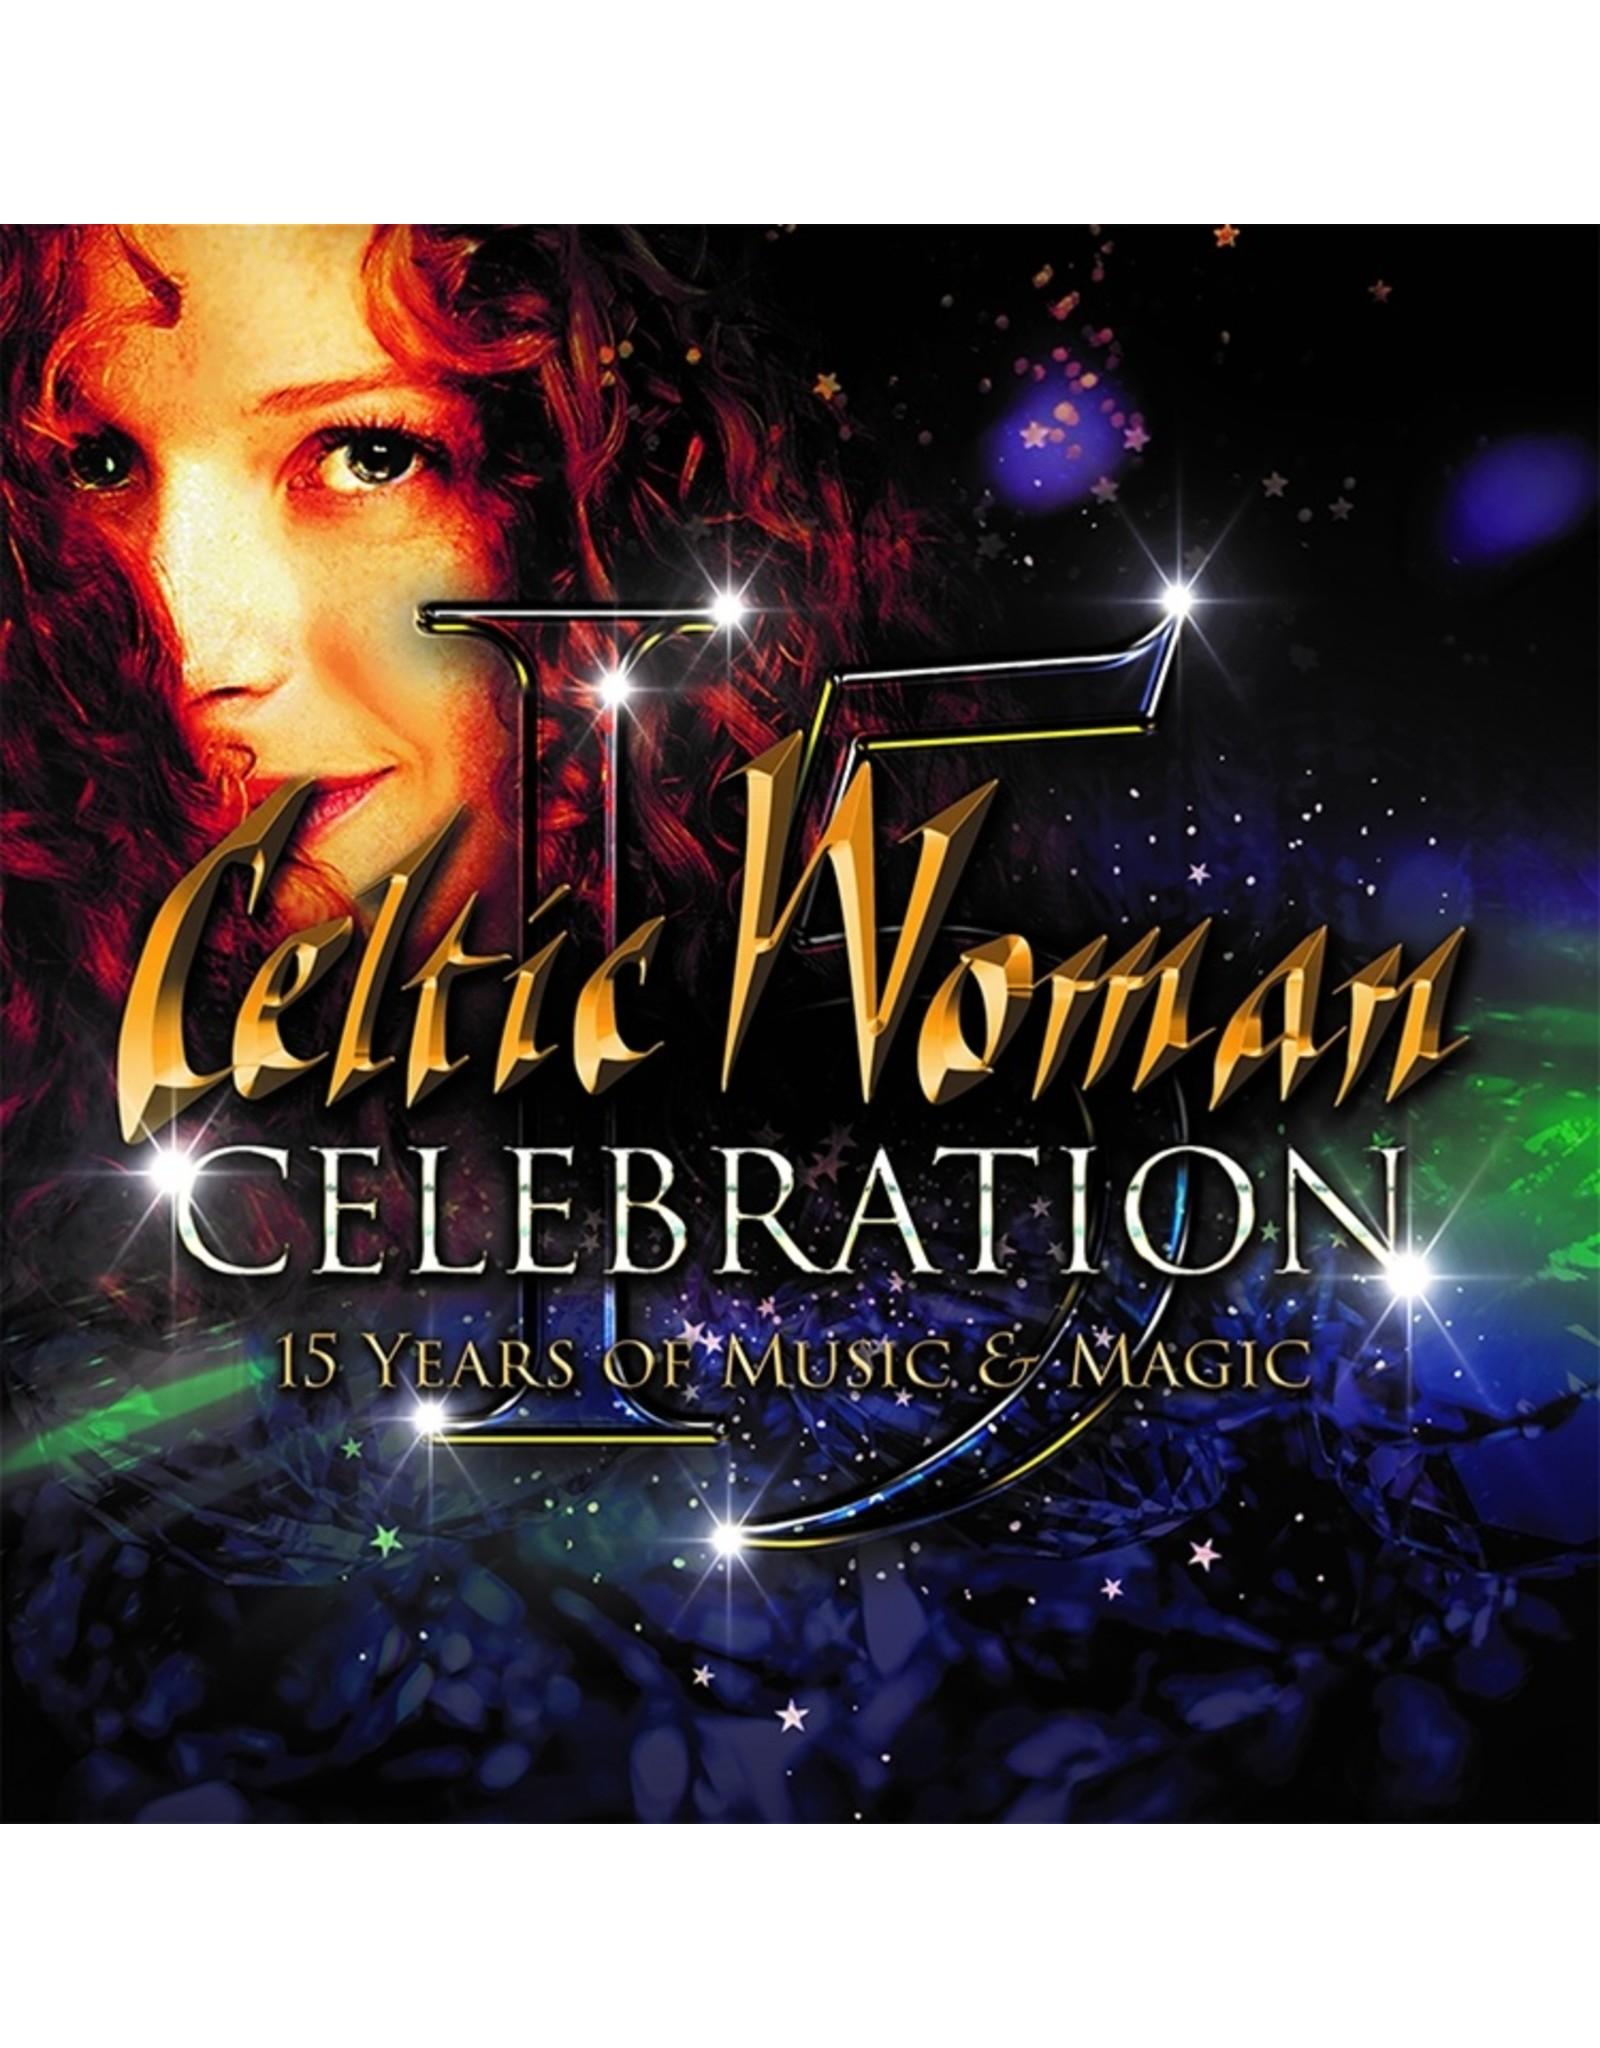 CELTIC WOMAN CD